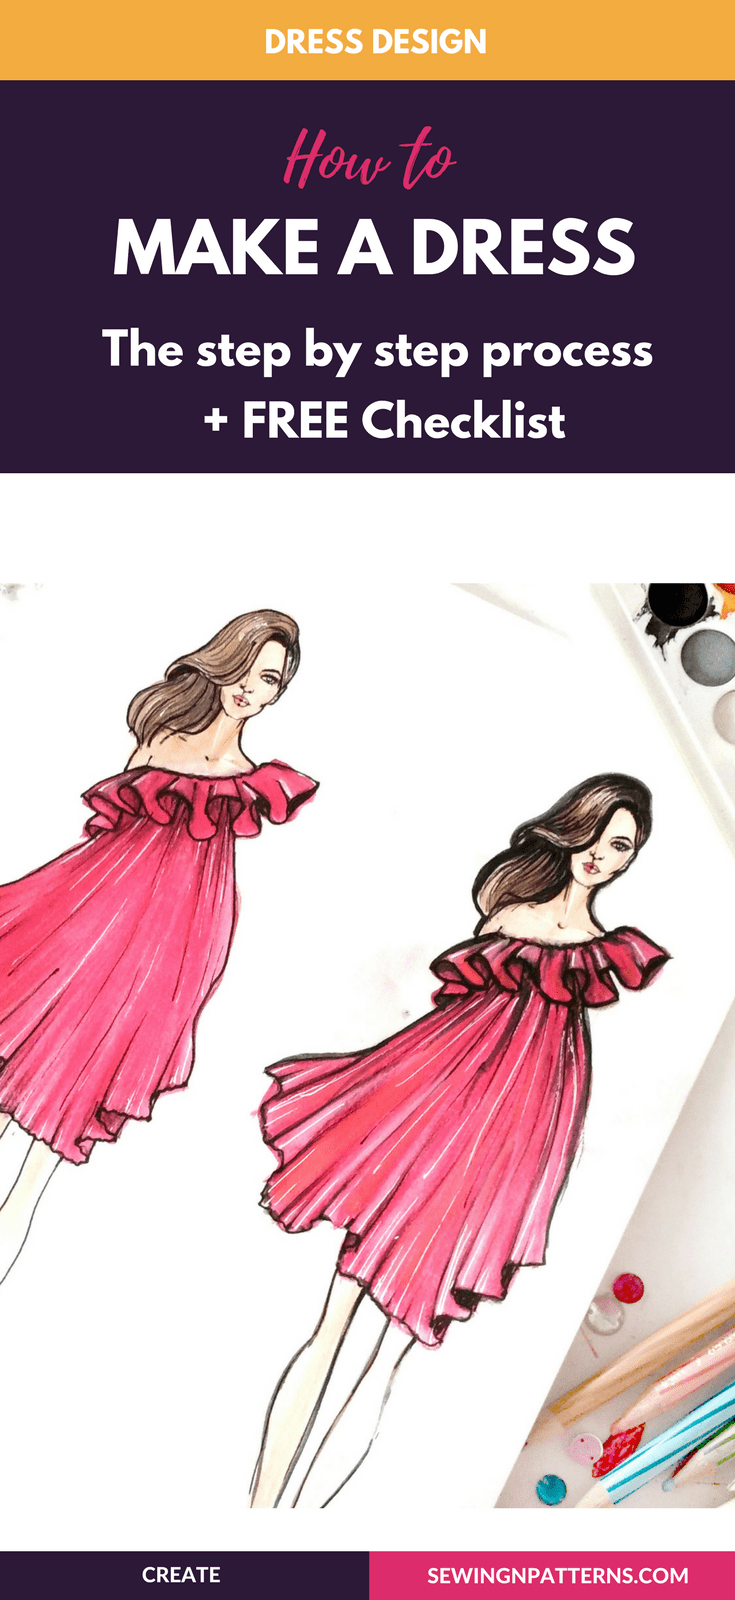 How To Start Your Journey With Dress Design Sewingnpatterns Dress Design Drawing Illustration Fashion Design Dress Design Sketches